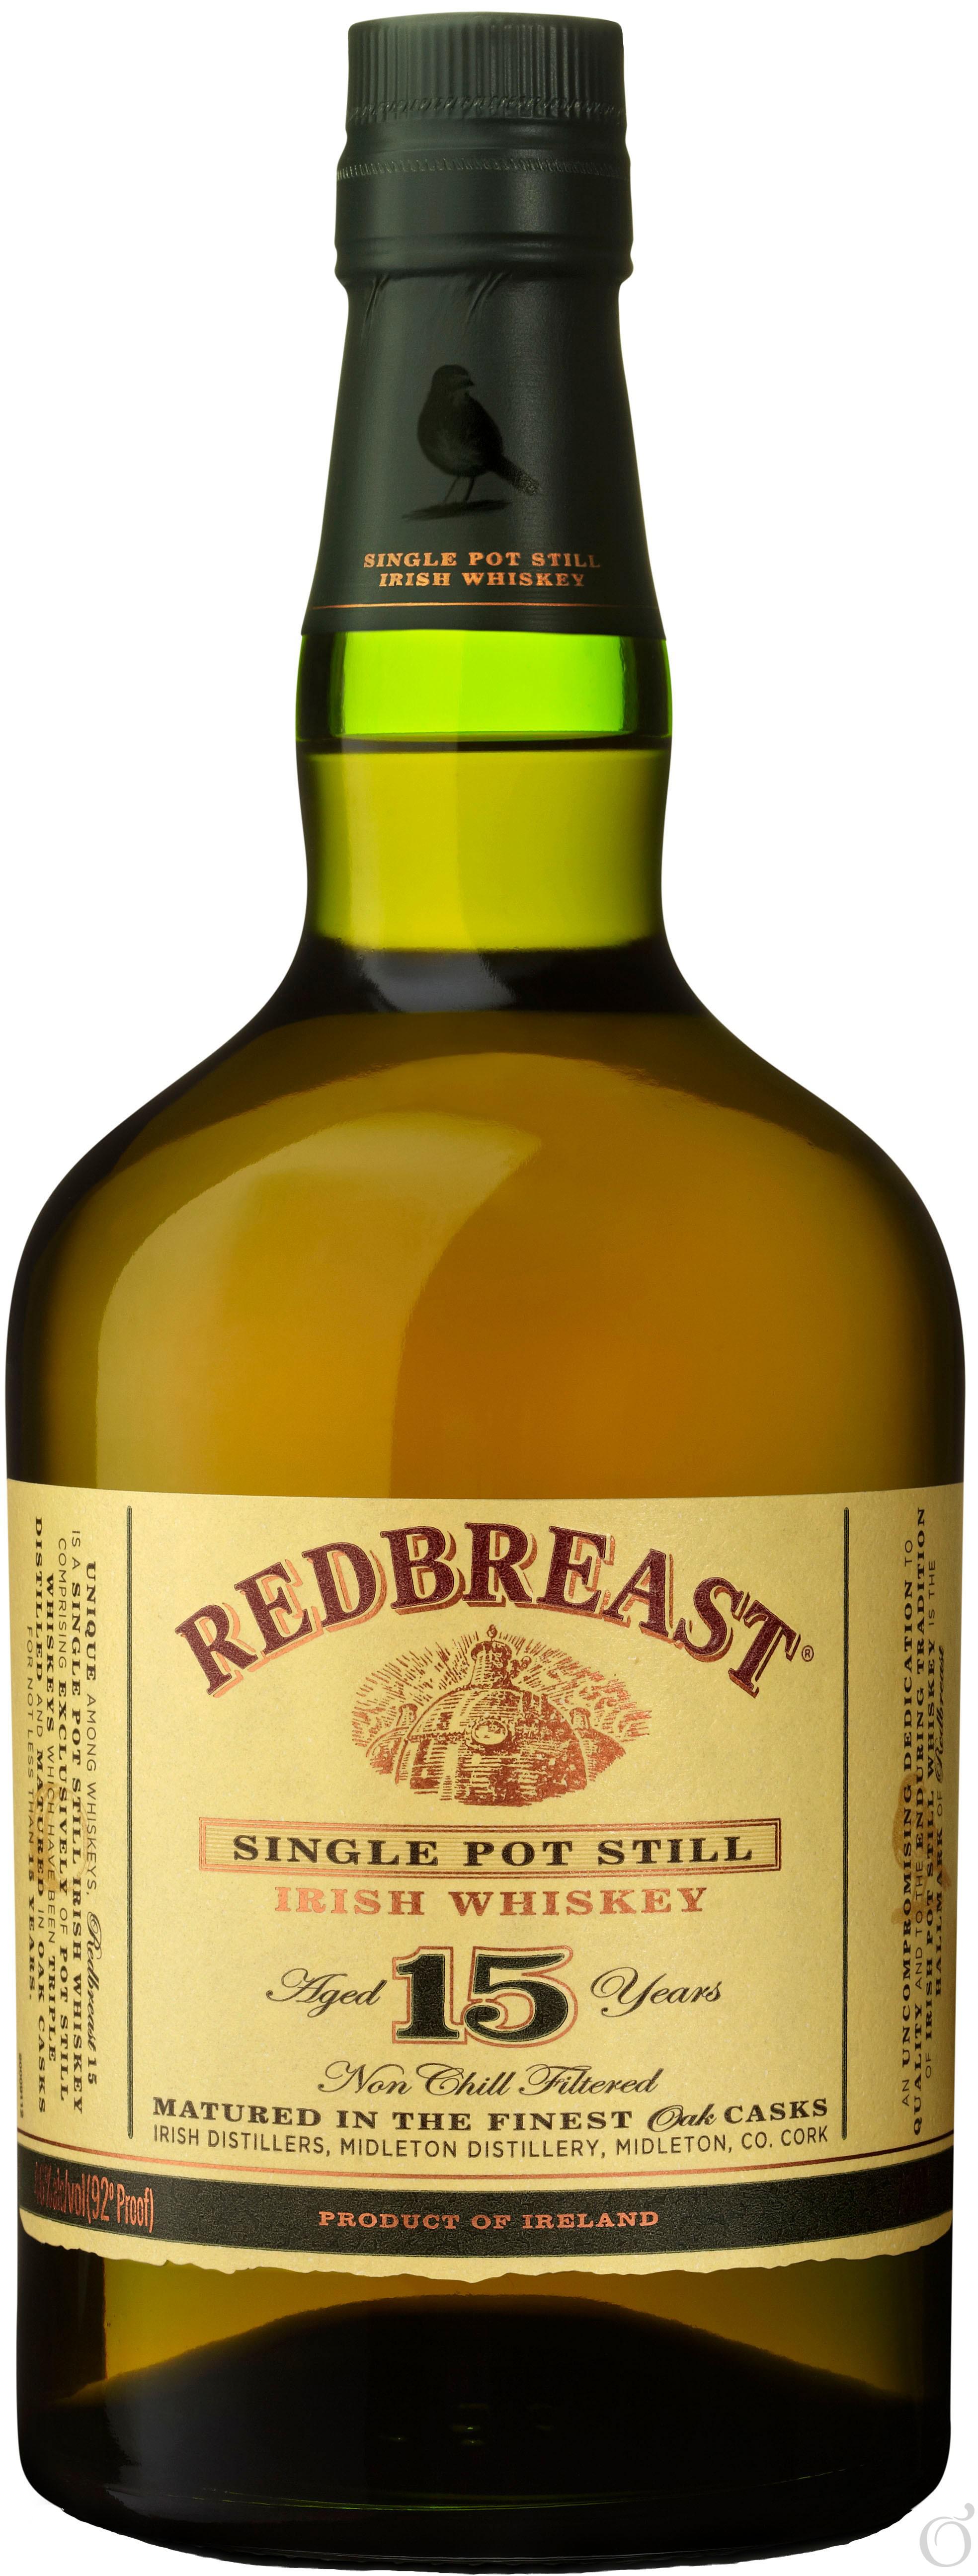 Redbreast Whiskey 15 Years Old Single Pot Still Irish Whiskey